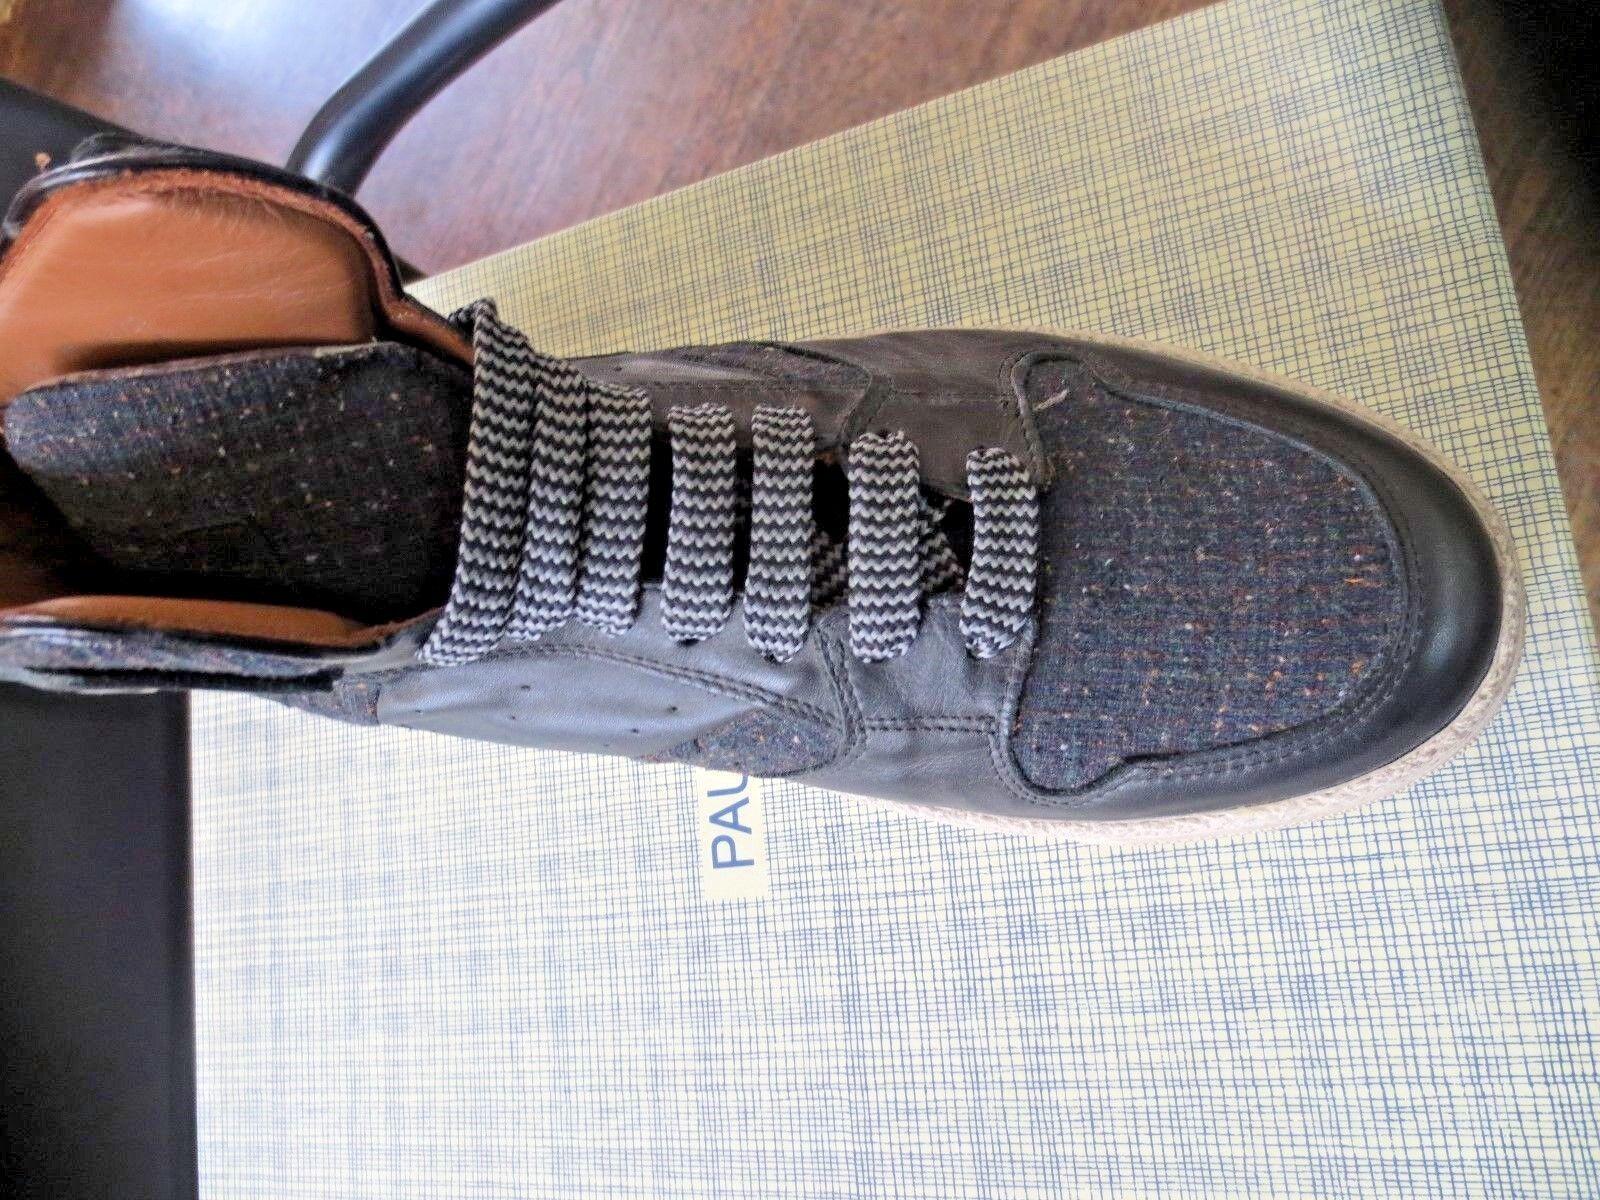 Paul & Joe basket nappa noir tweed NEUVE Valeur 230E Pointures 40,41,44 Scarpe classiche da uomo